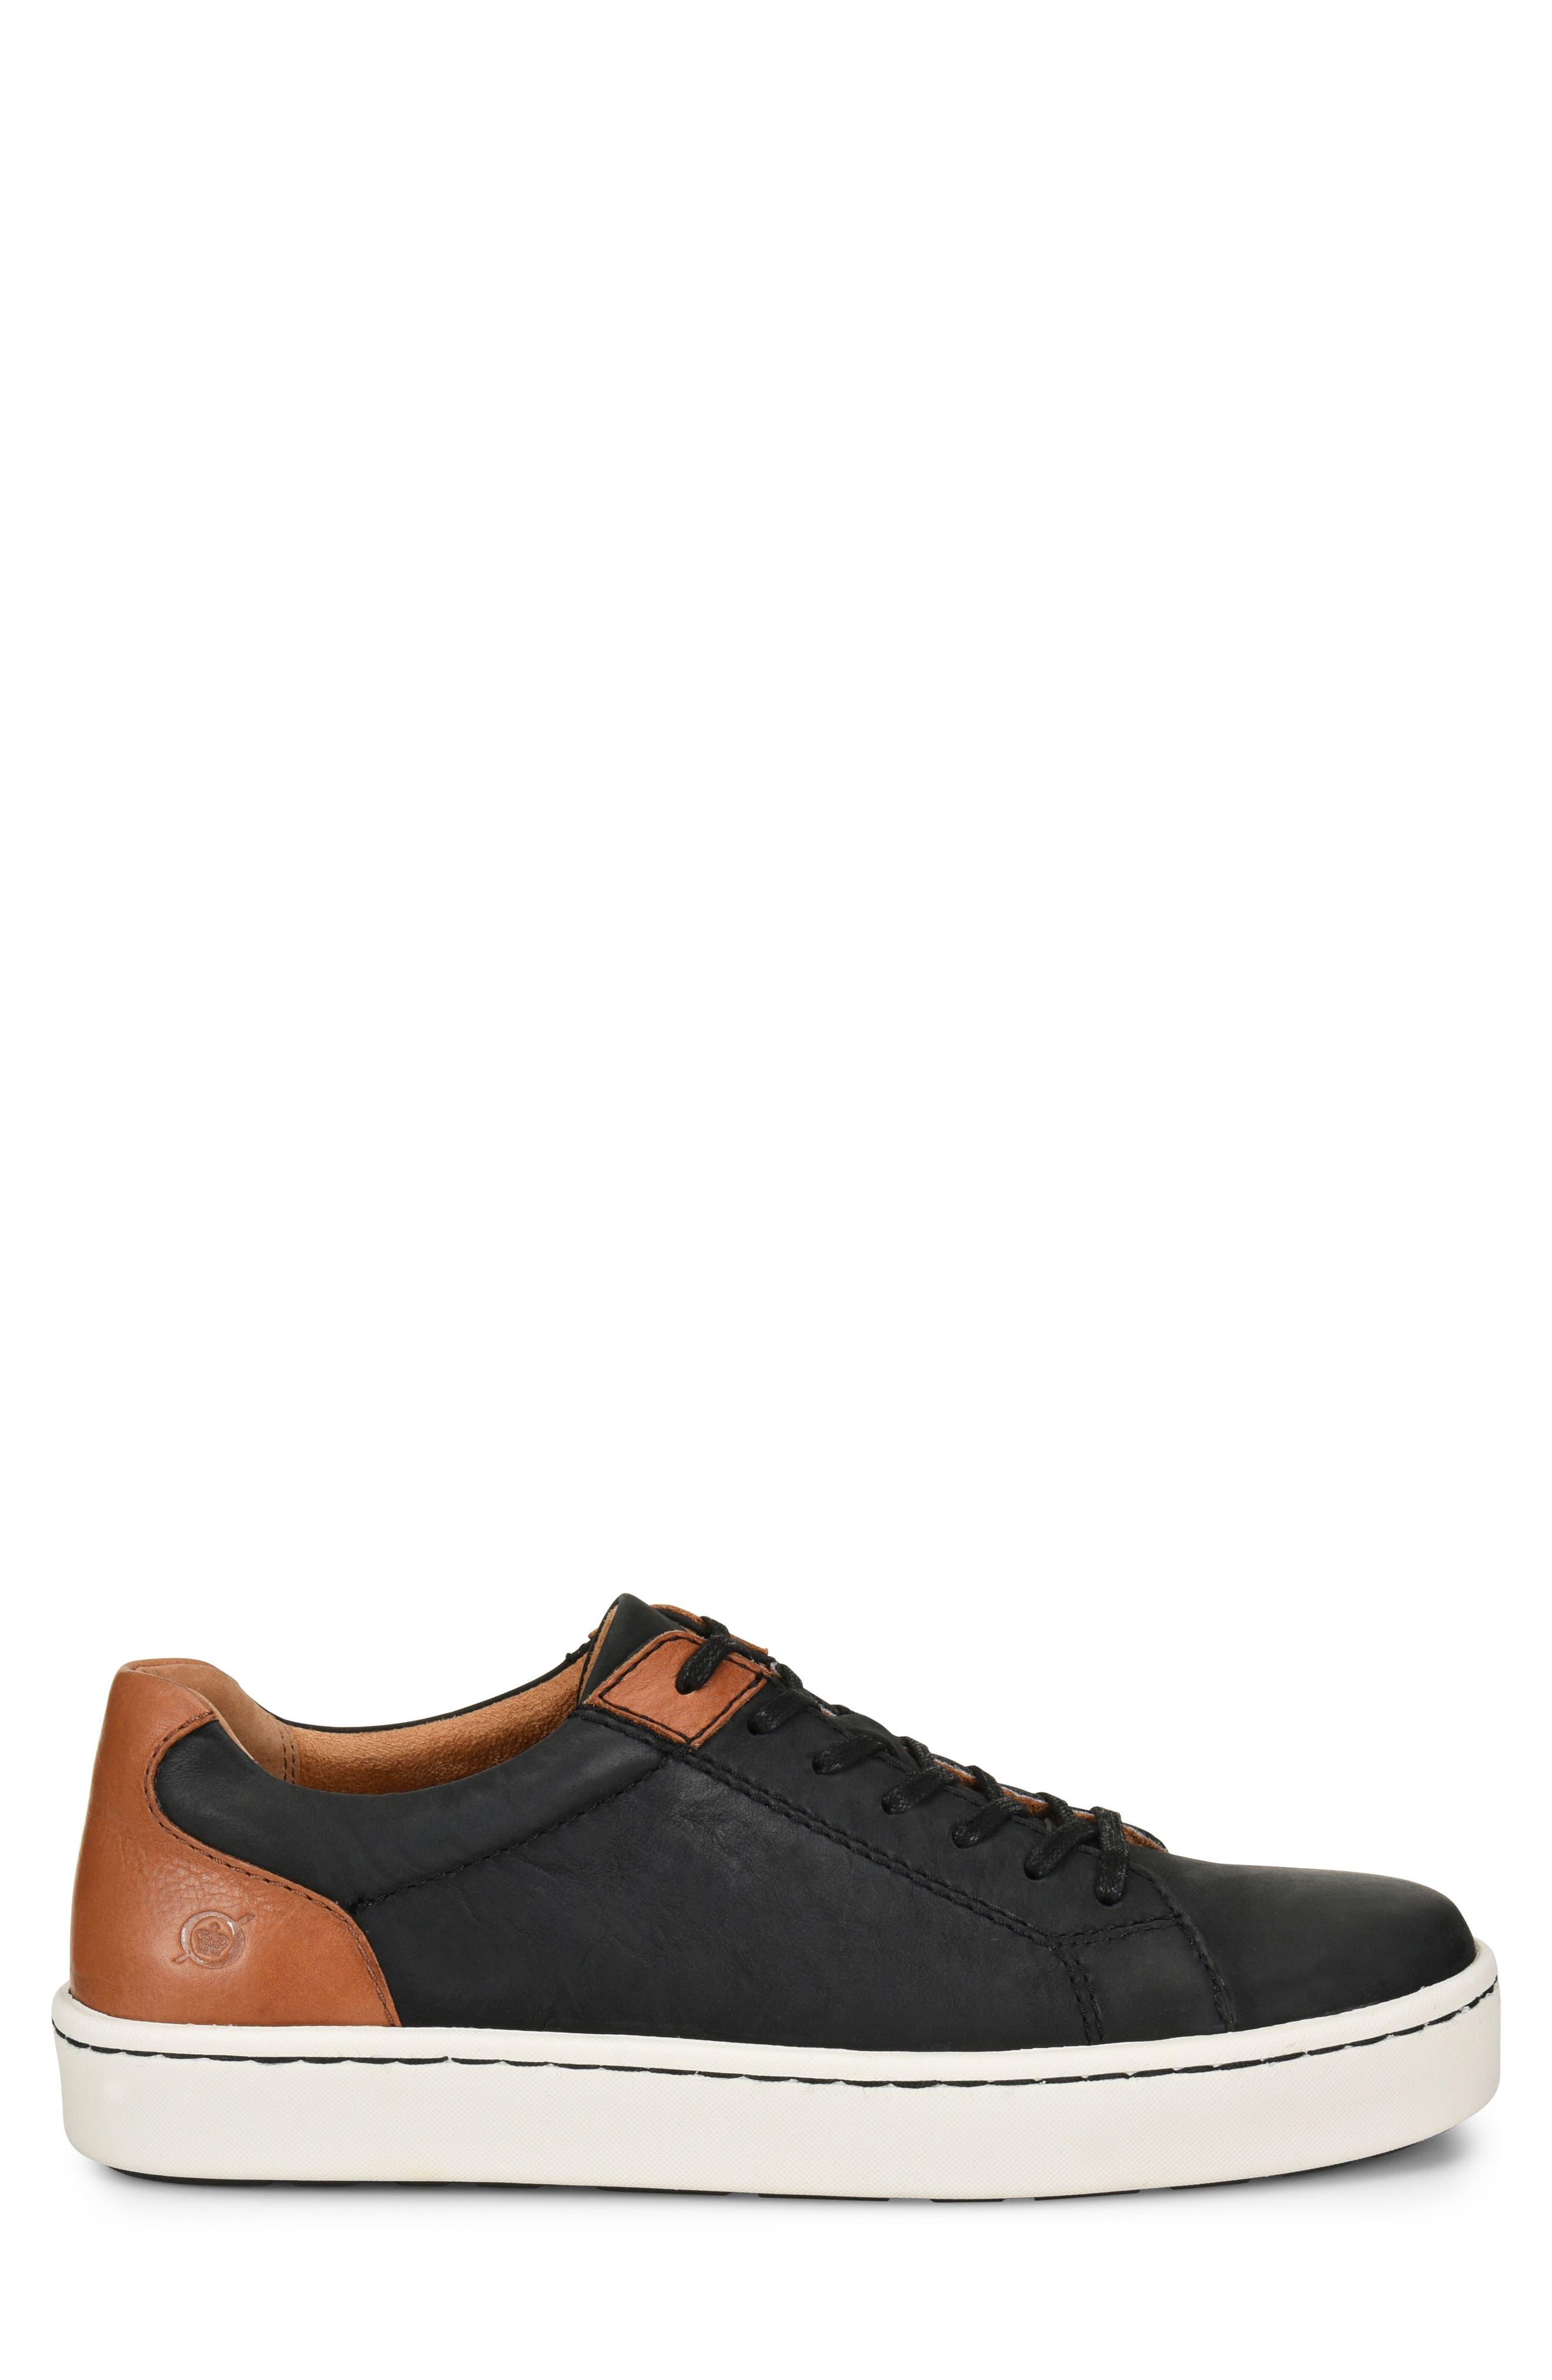 Jib Sneaker,                             Alternate thumbnail 3, color,                             001